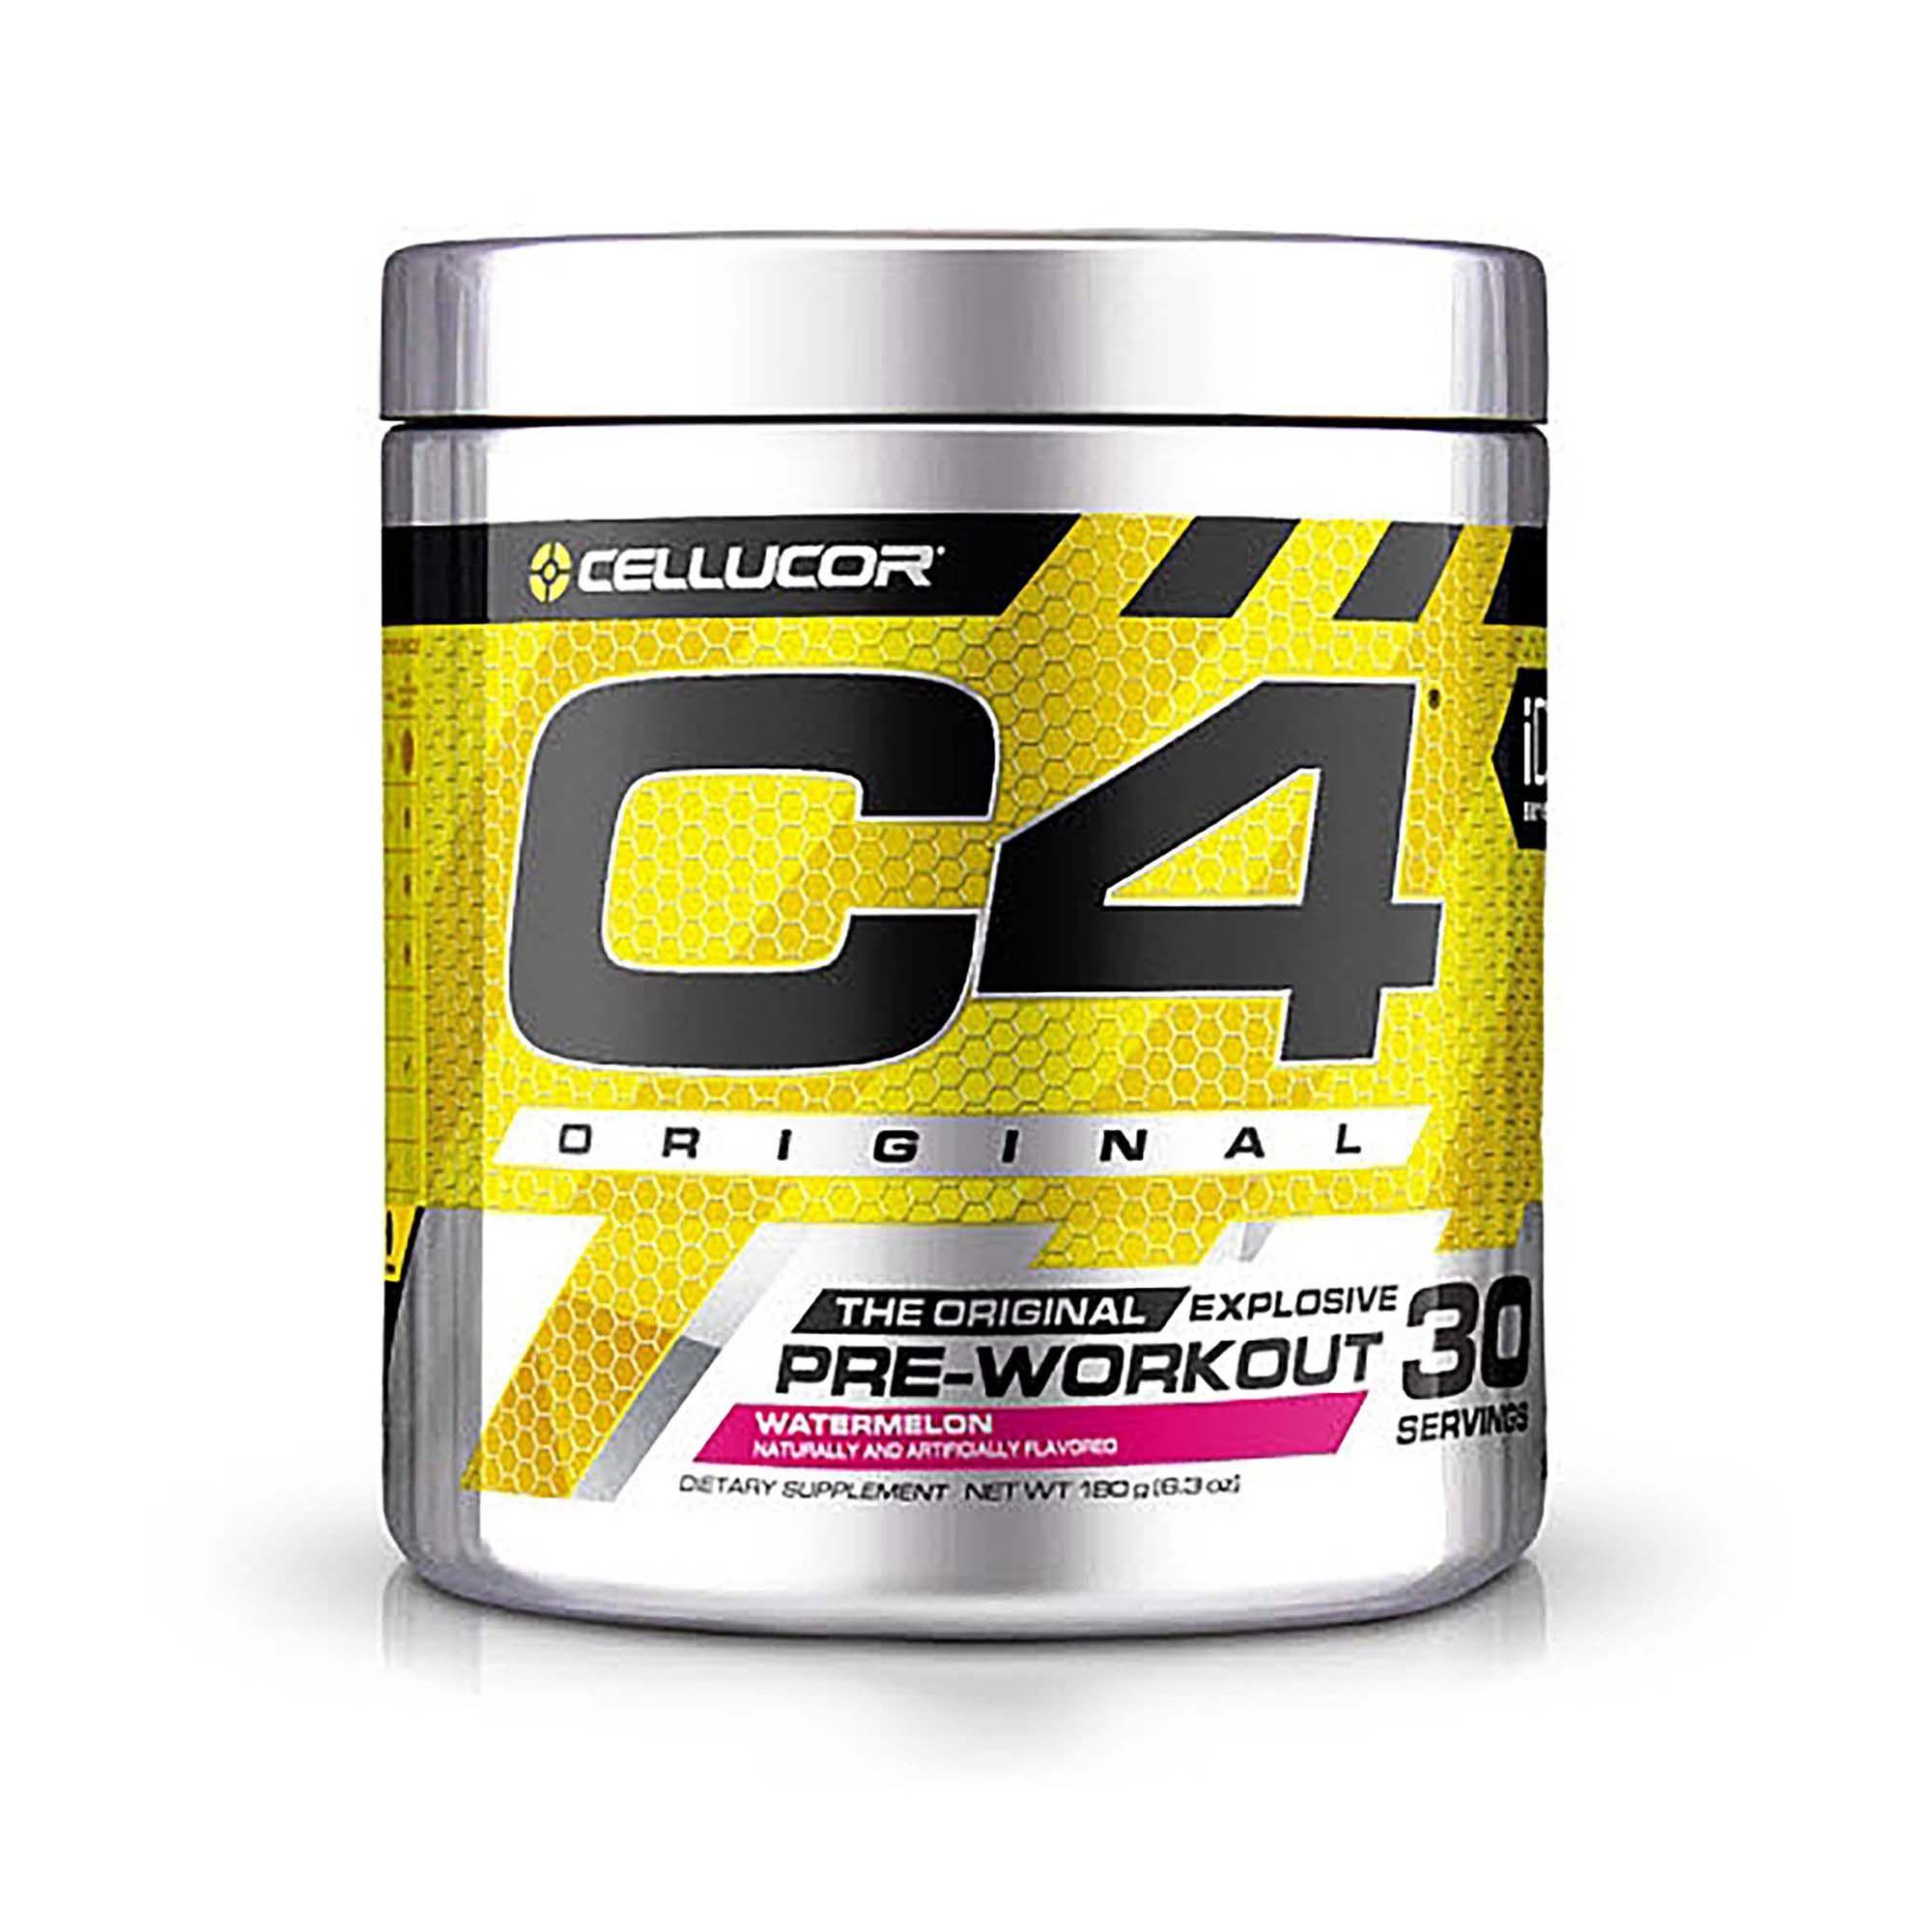 Cellucor® C4® Original (With images) Preworkout